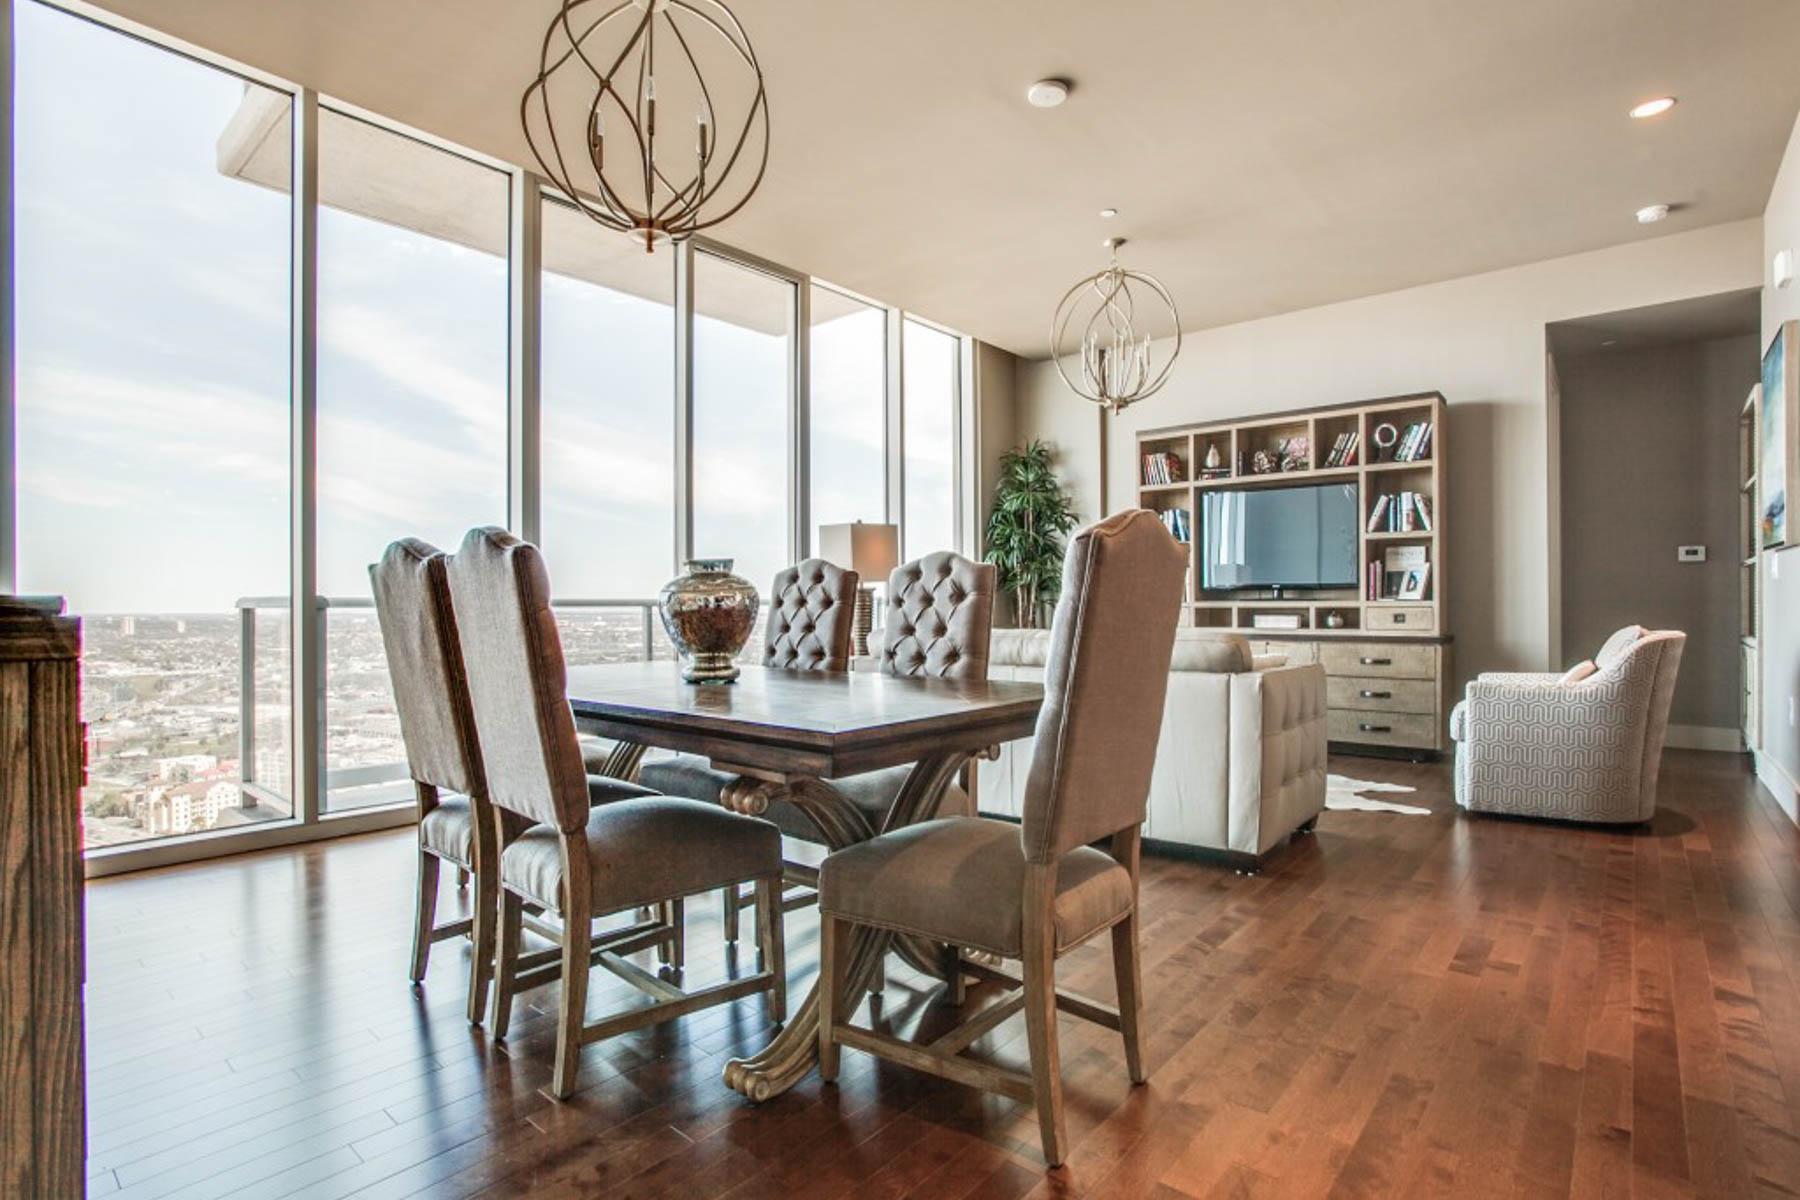 Condominium for Sale at Sleek, Sophisticated Condo with Breathtaking View 610 E Market St 3214 San Antonio, Texas, 78205 United States